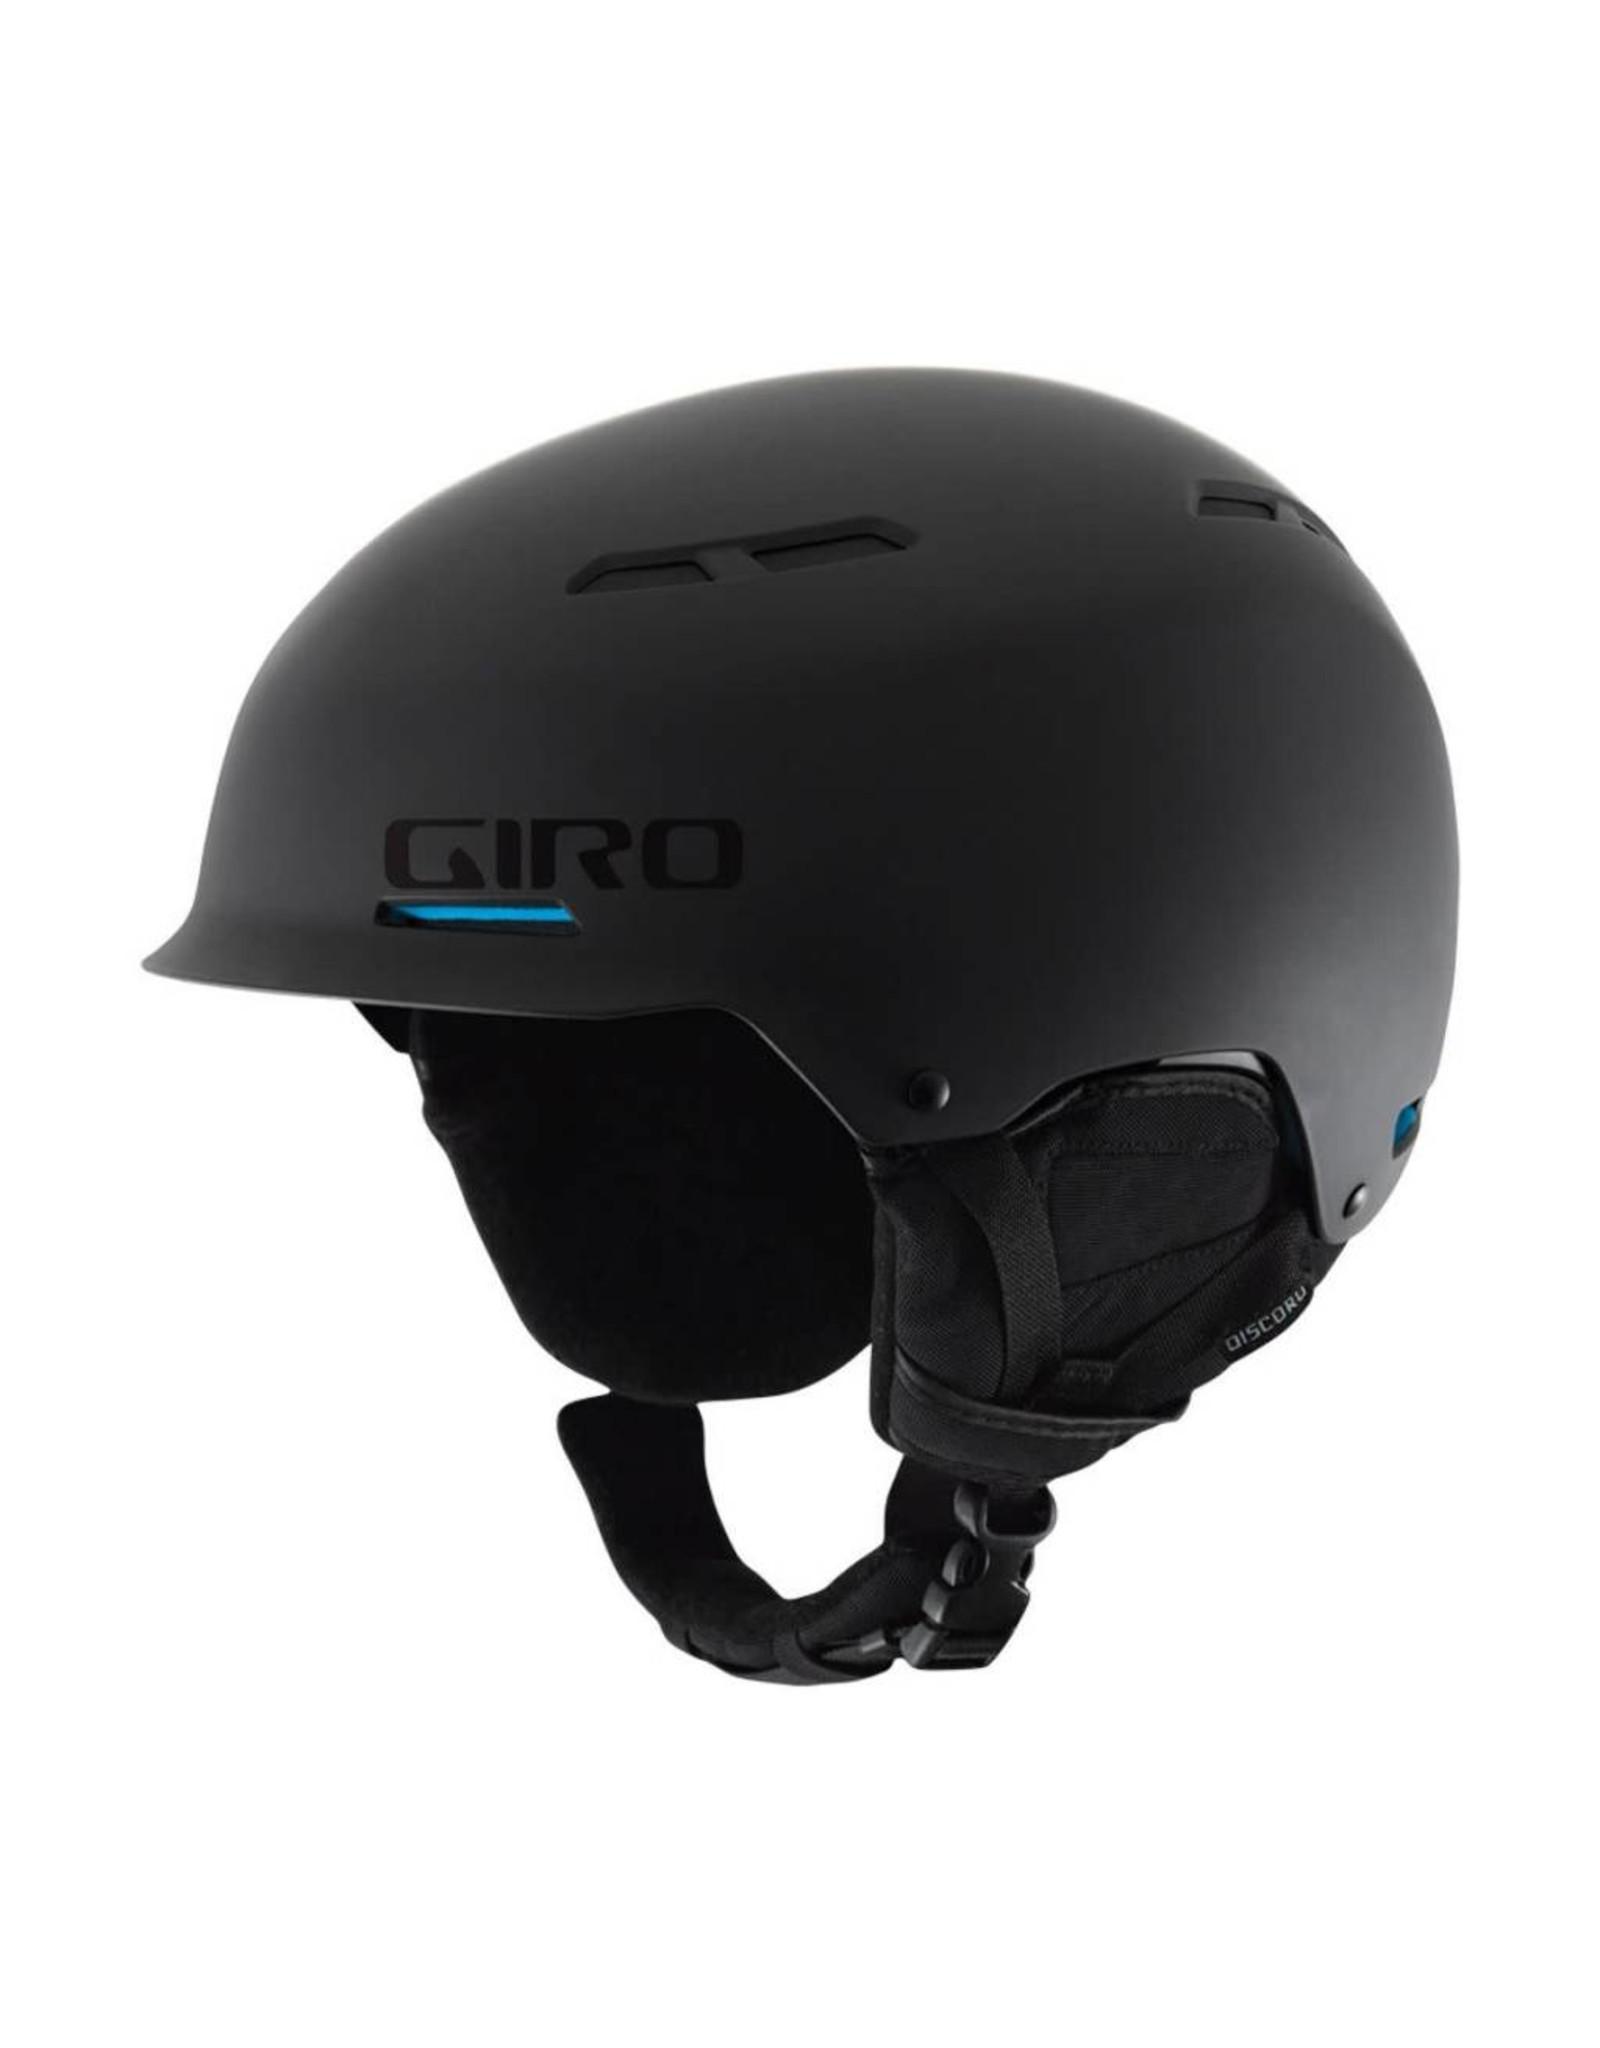 Giro GIRO Discord F17